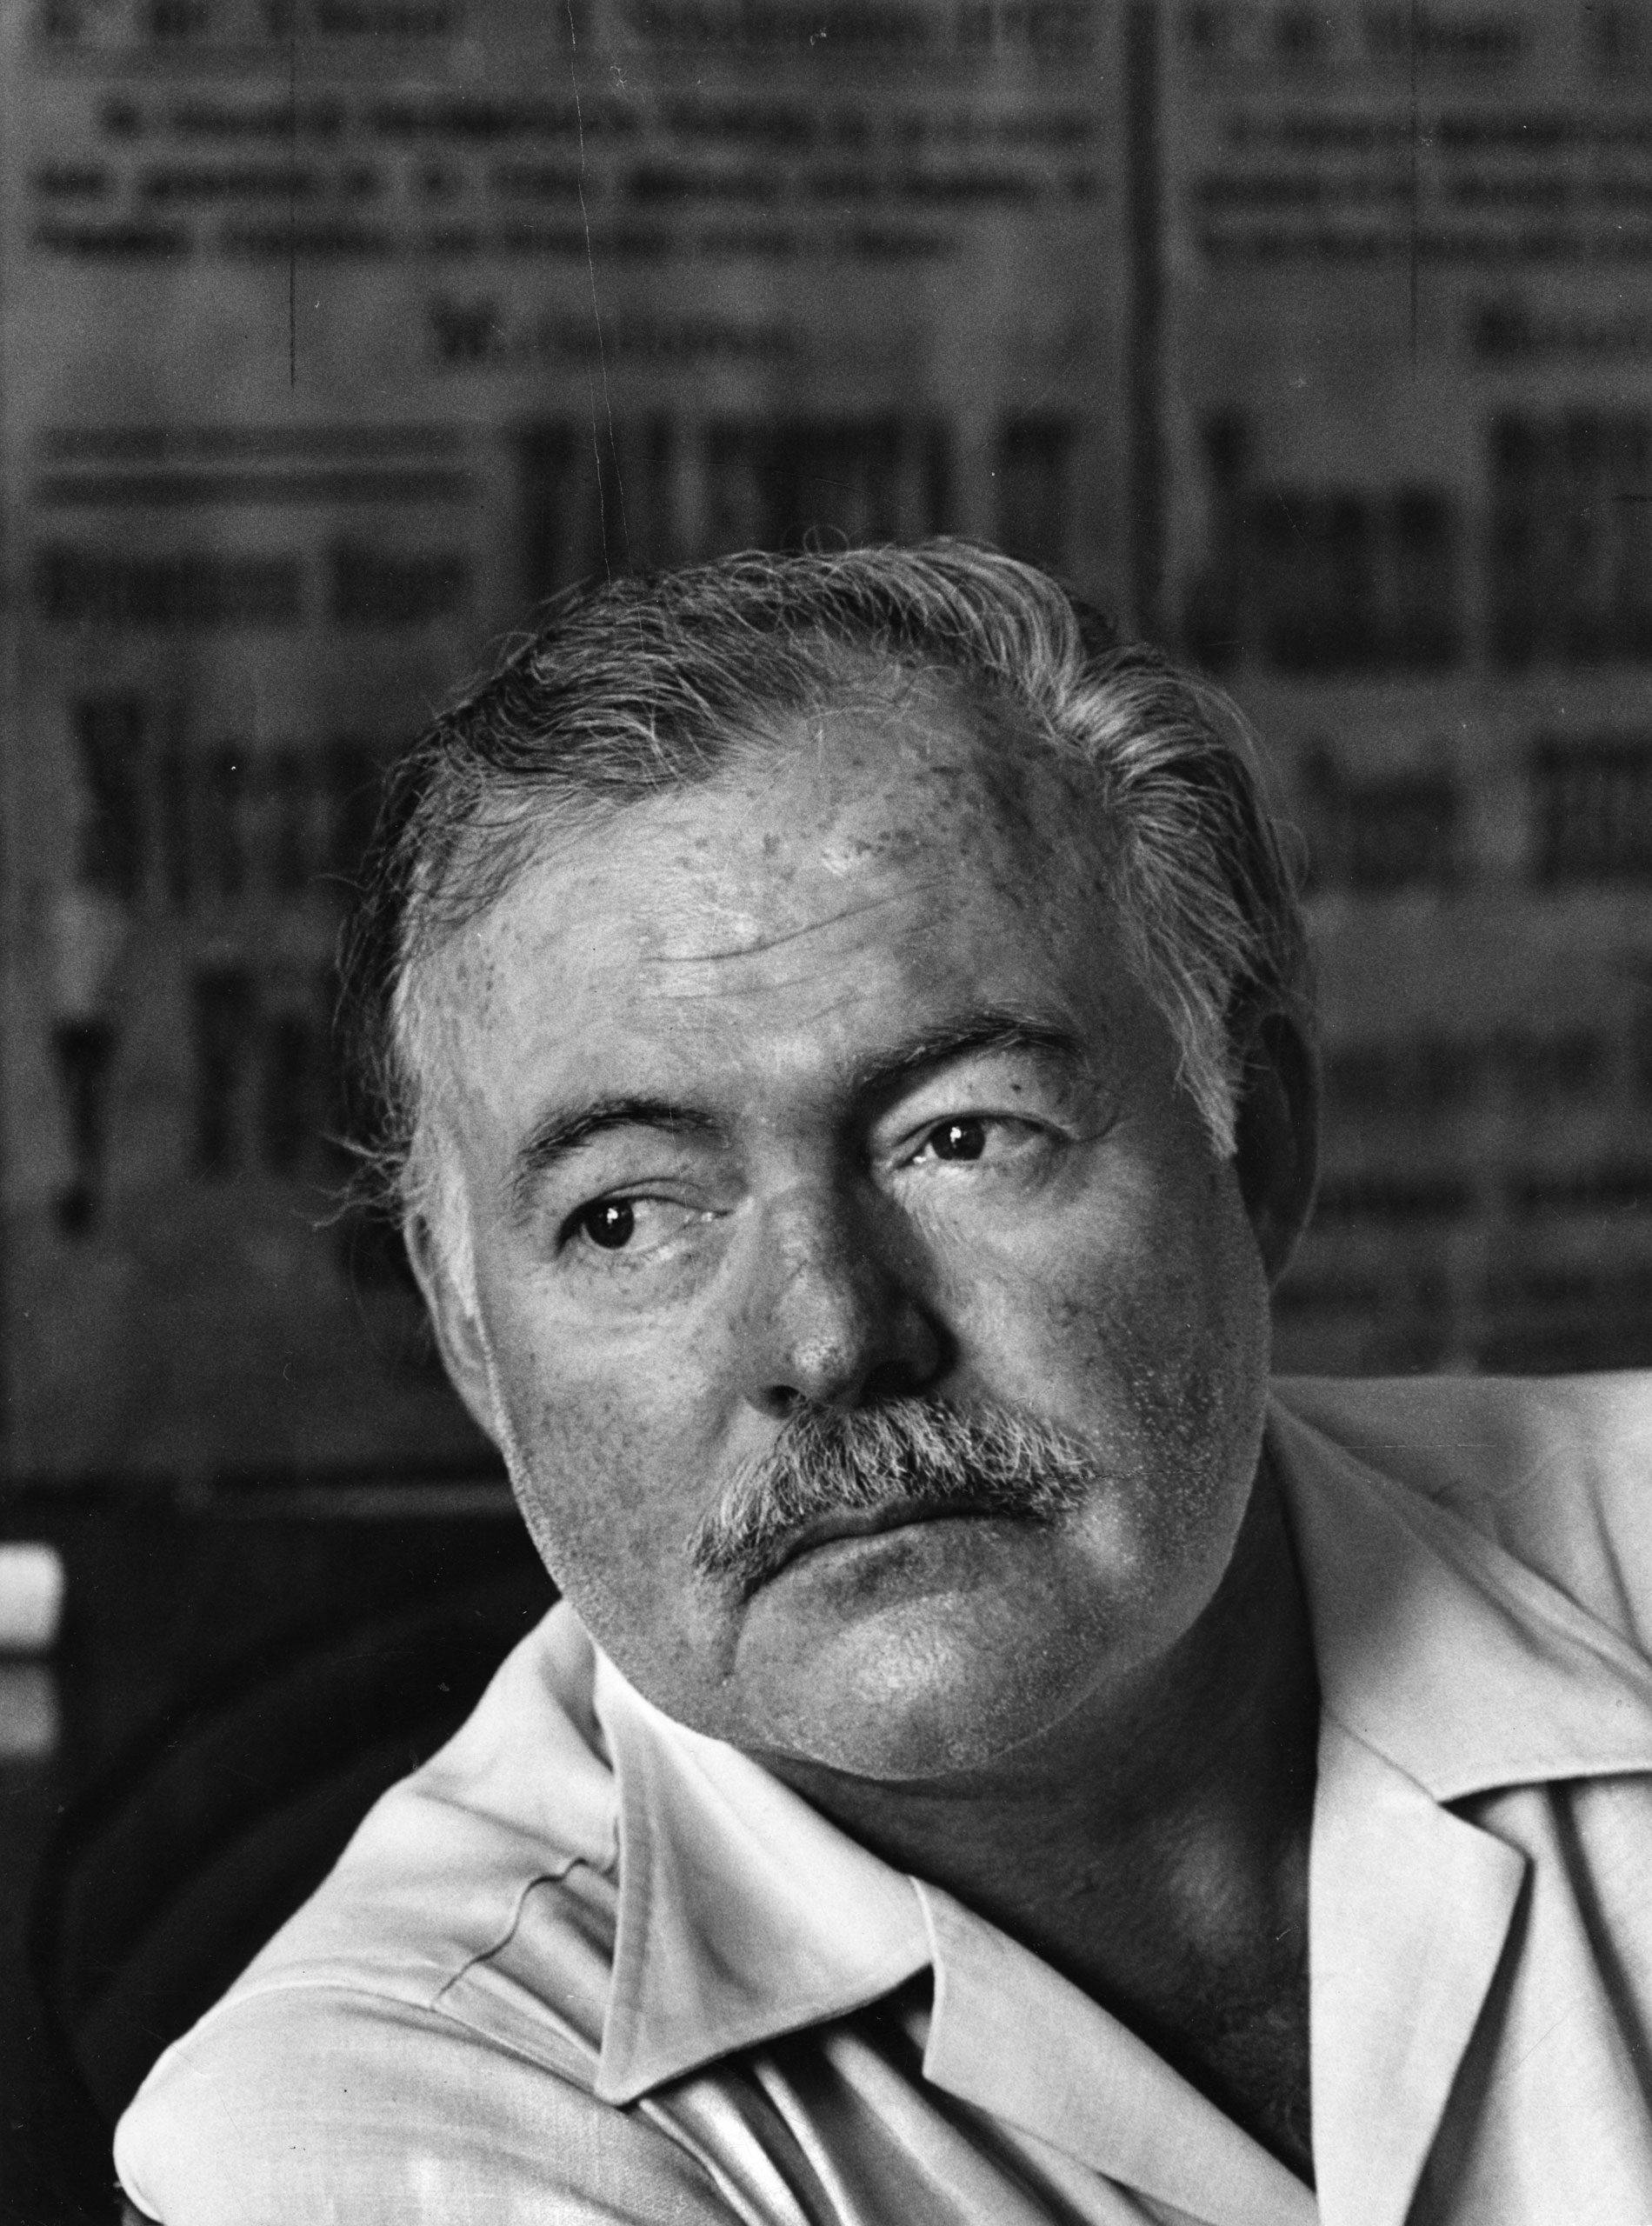 Ernest Hemingway in Cuba August 1952